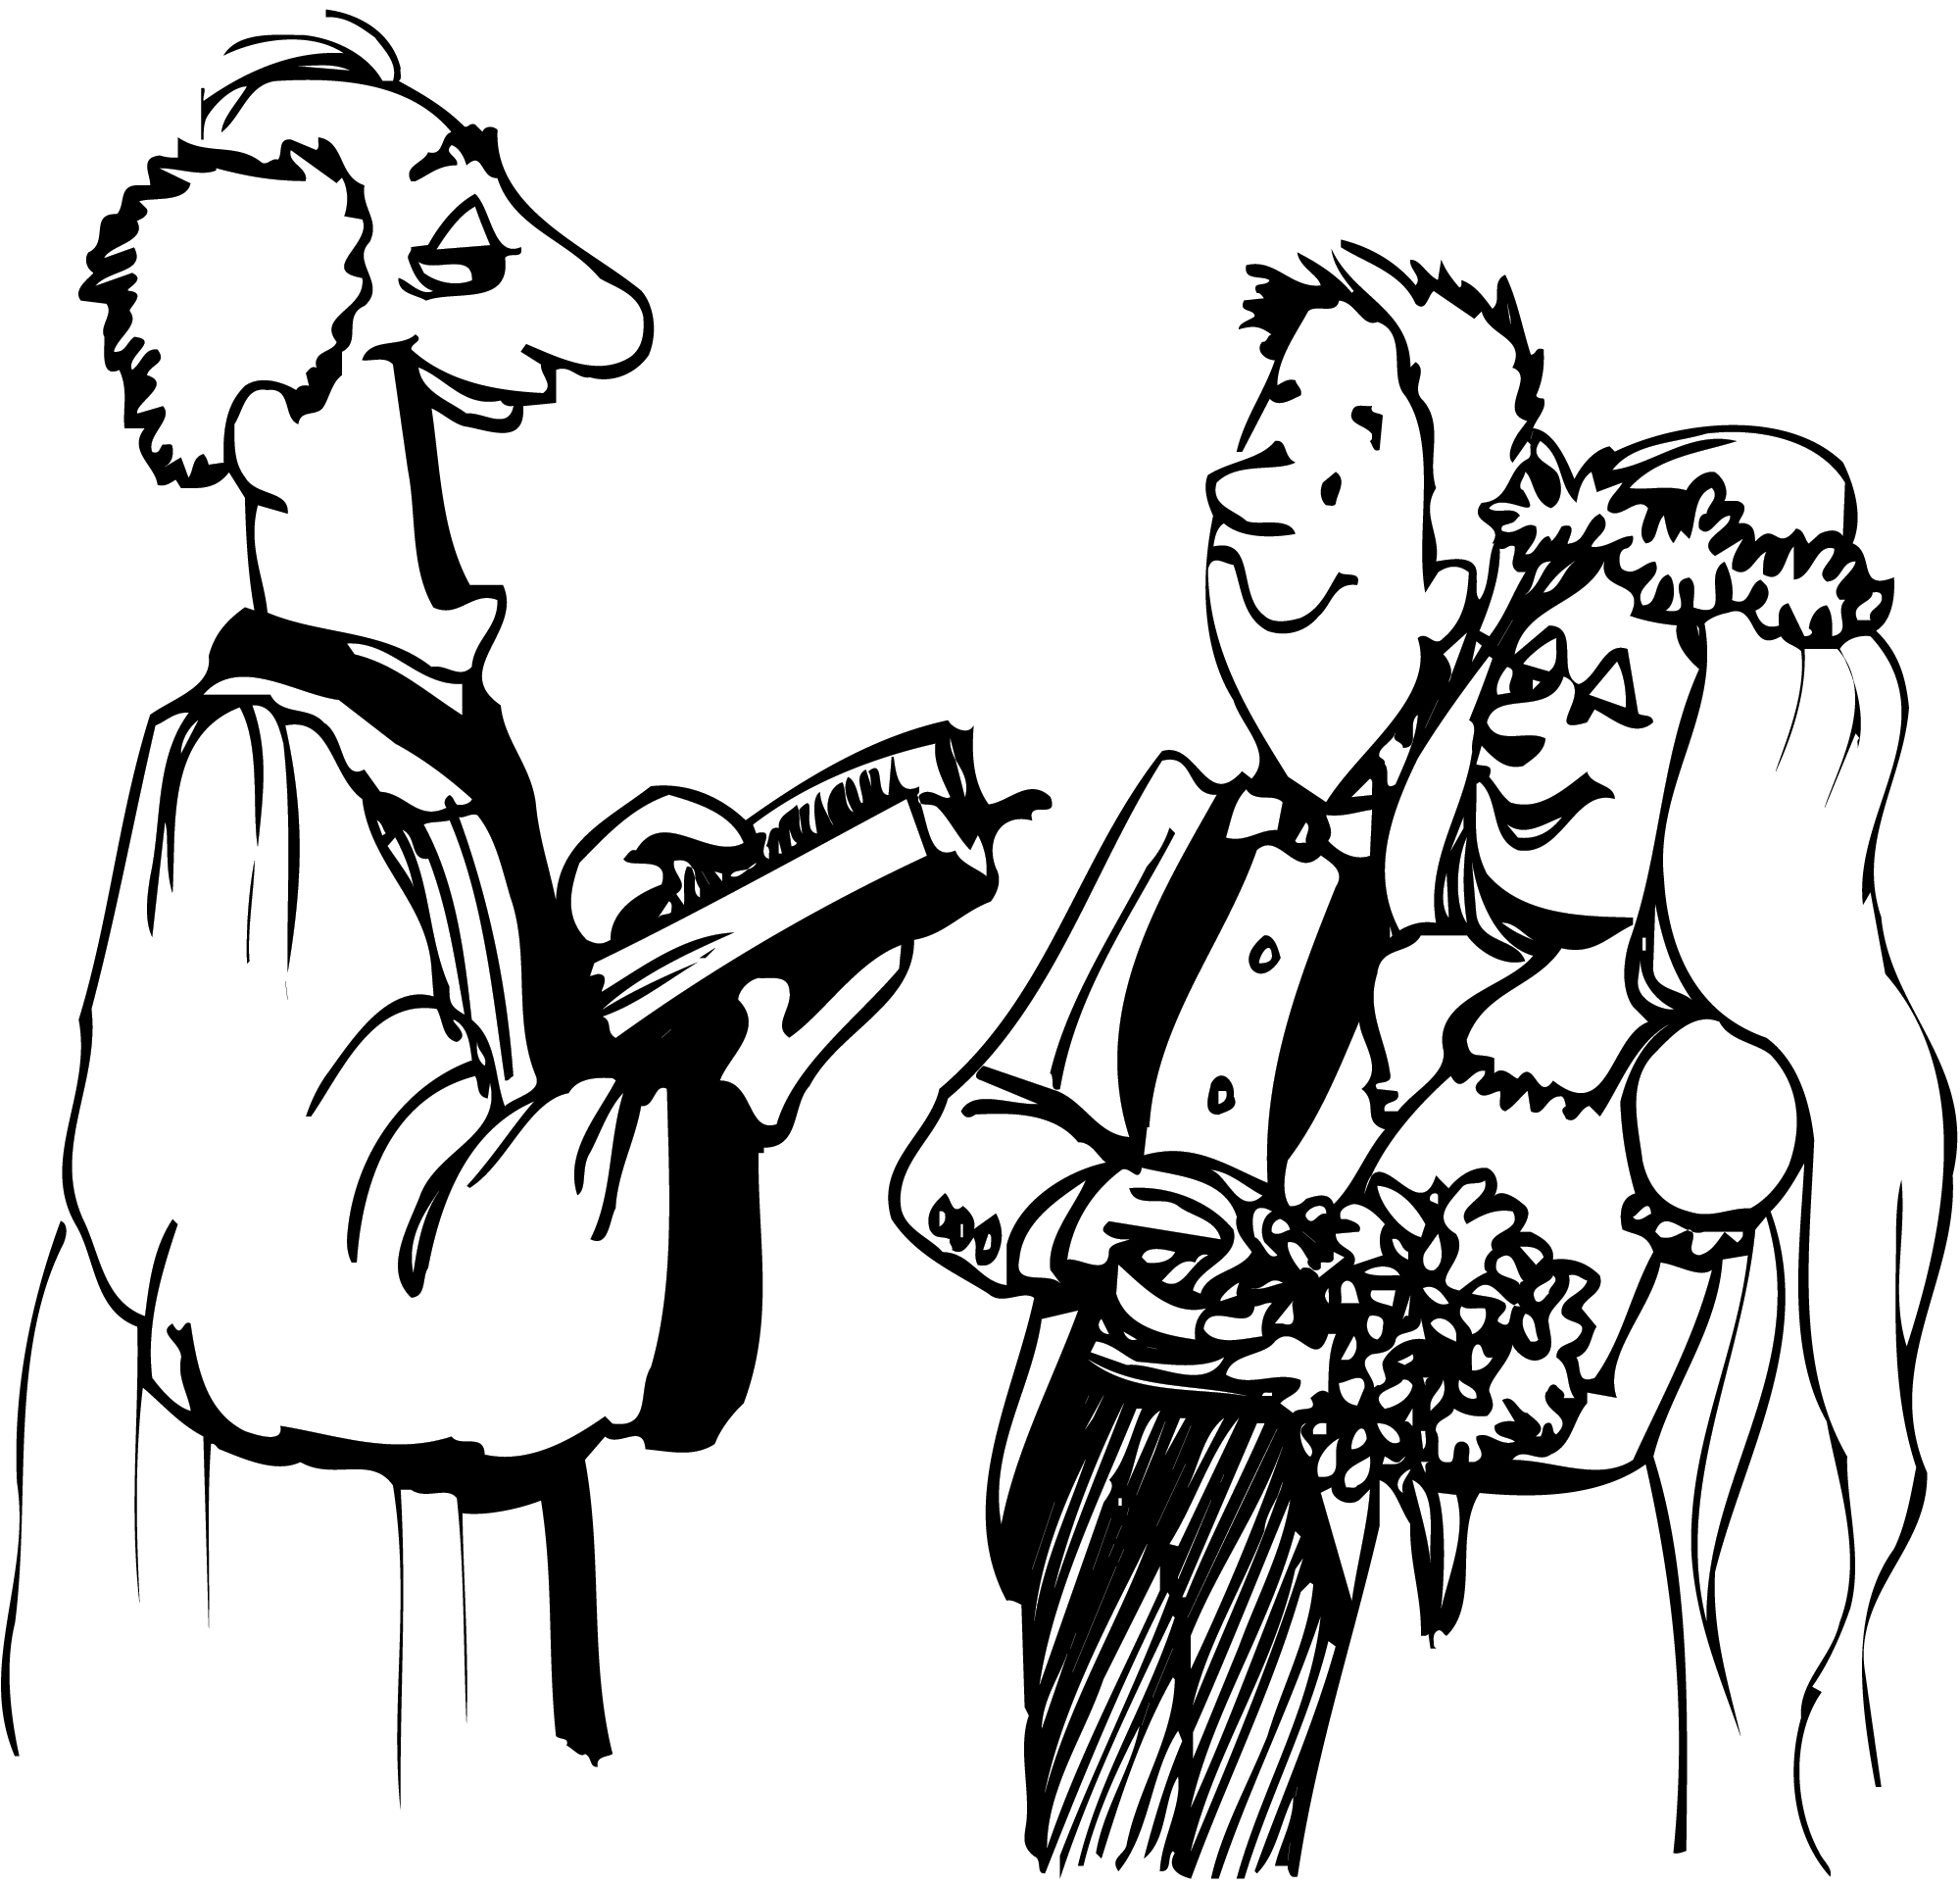 Weddingclipart-Weddingclipart-19